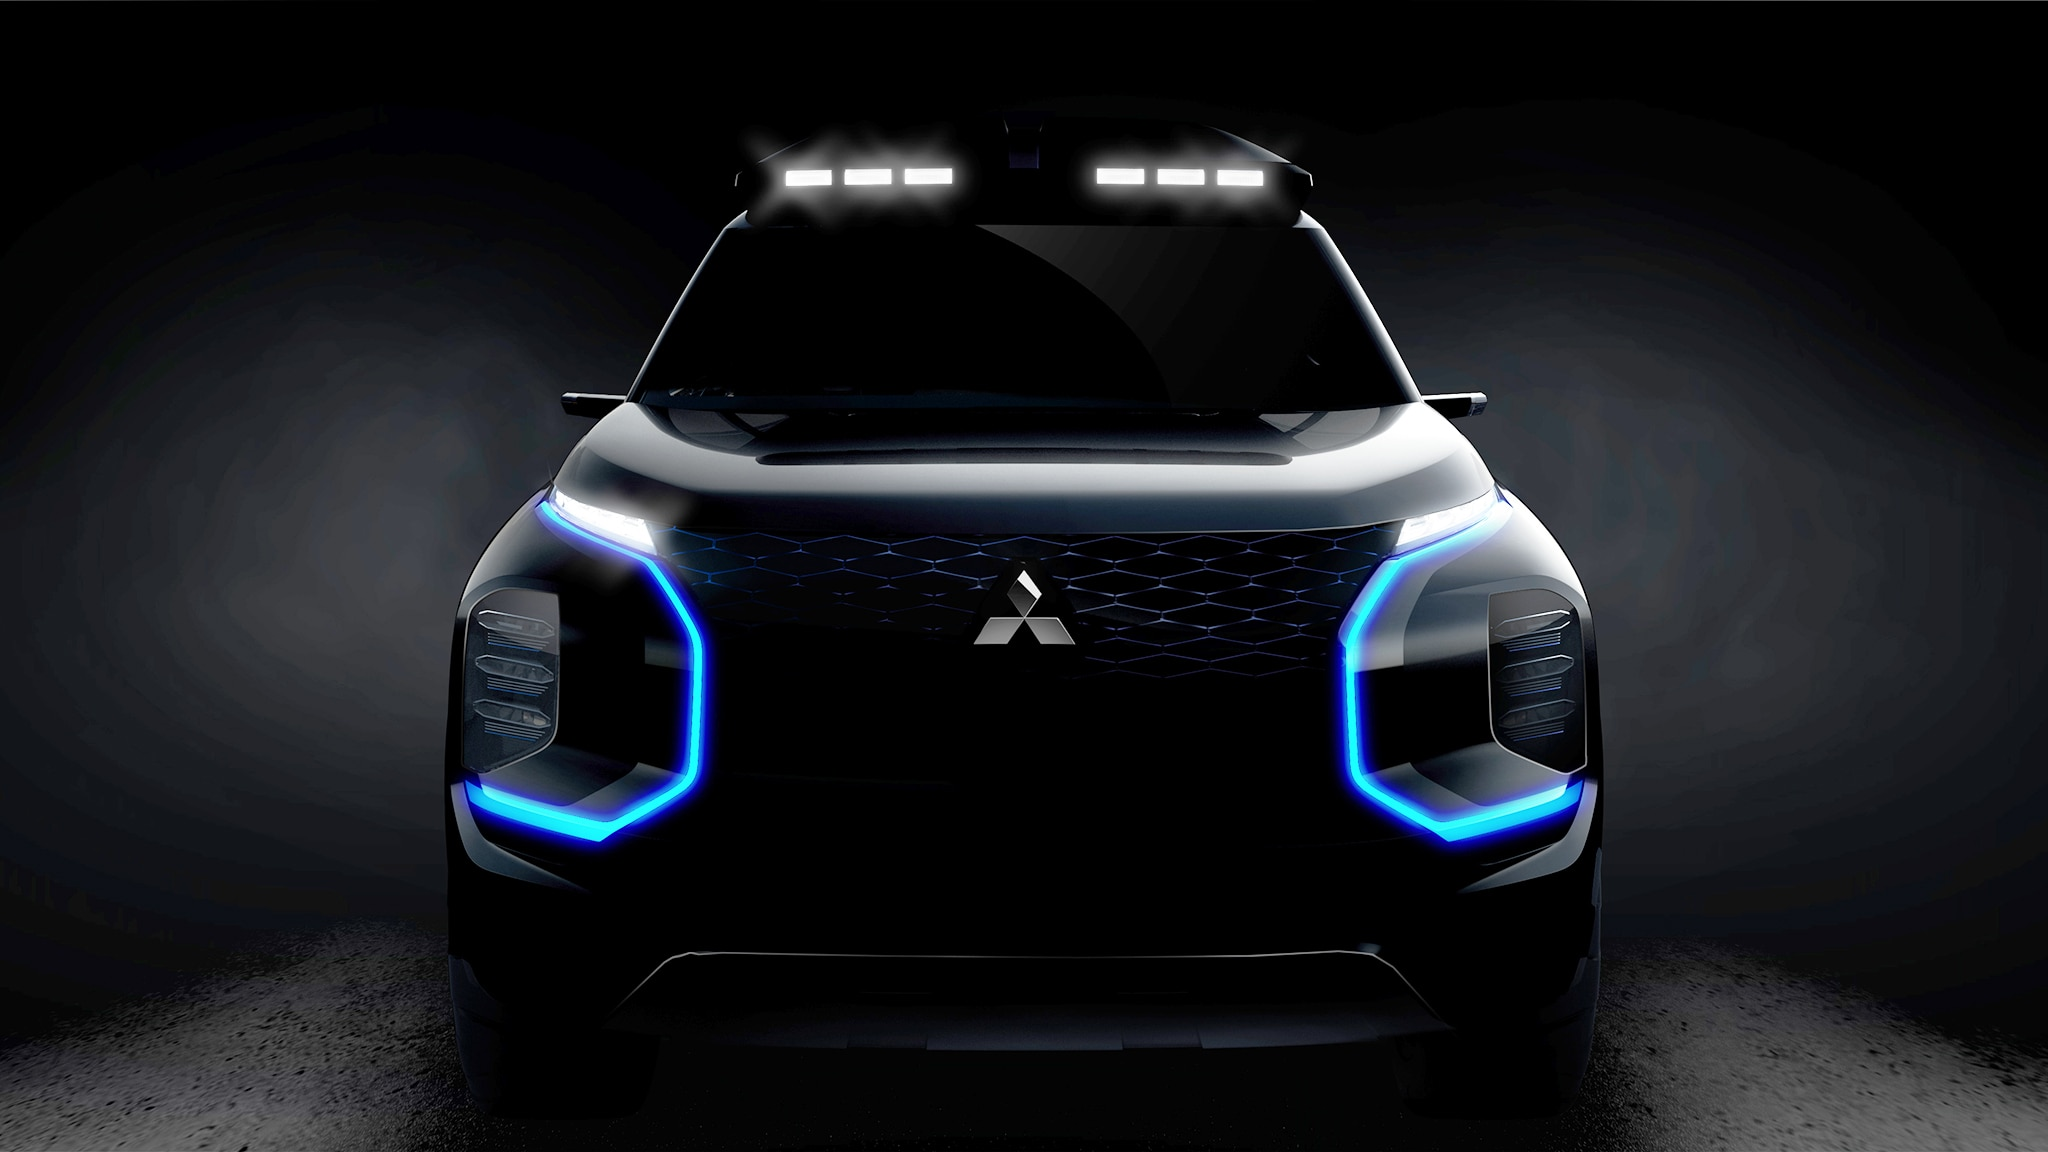 2019 Mitsubishi GMS Teaser 1